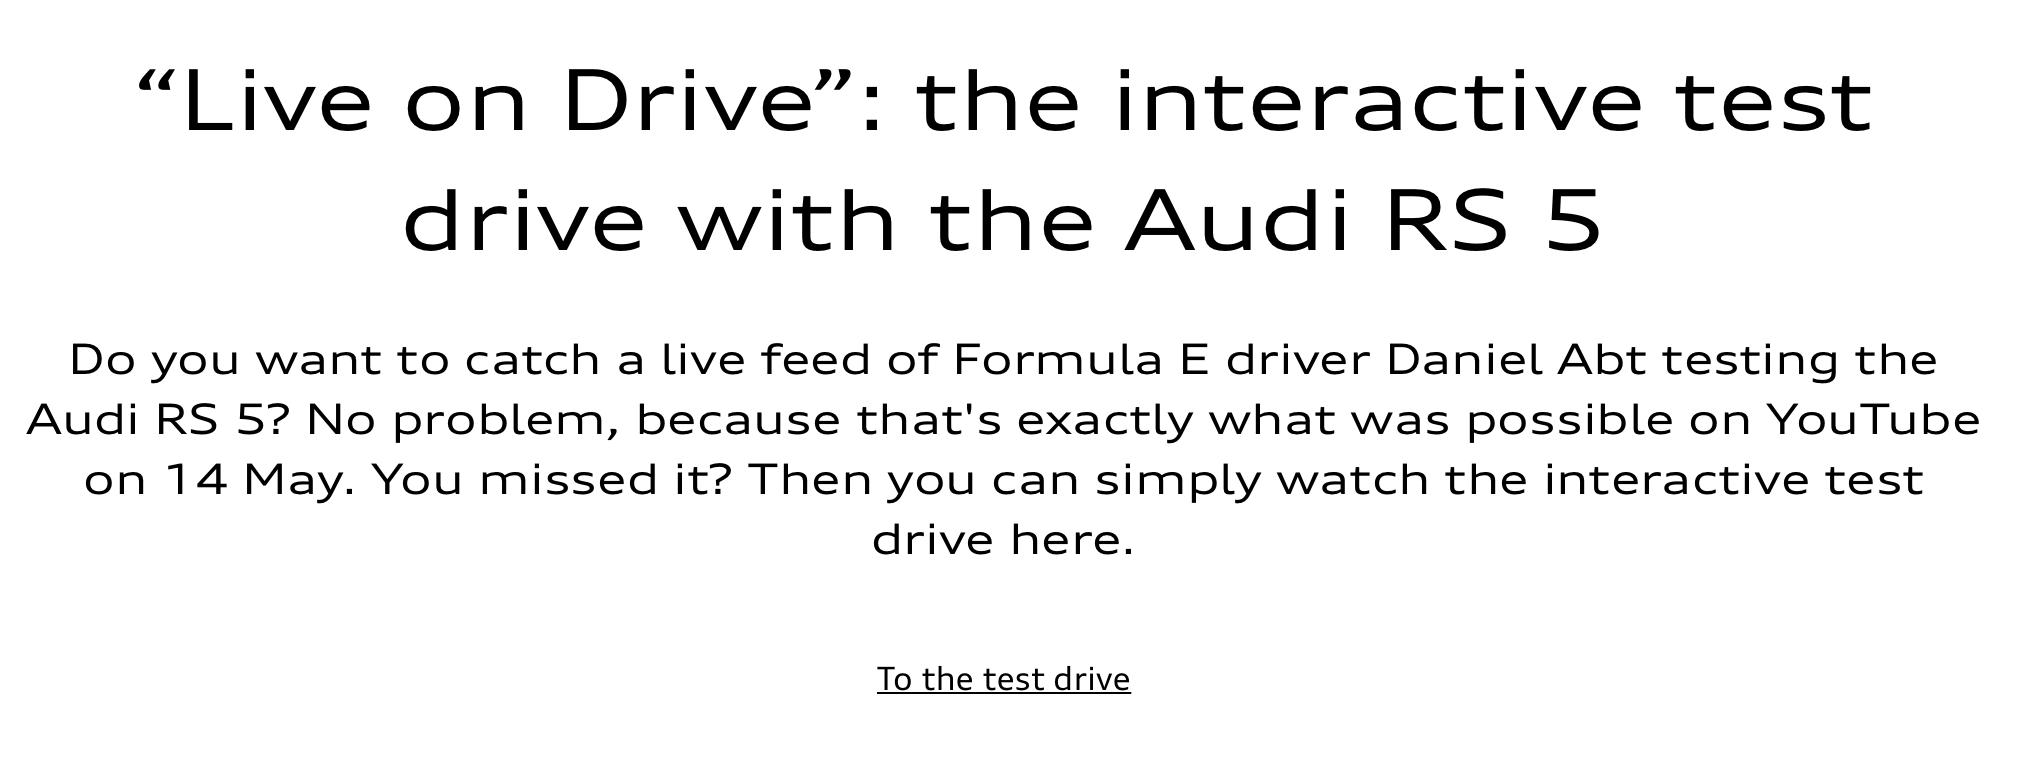 digital test drive cta for Audi